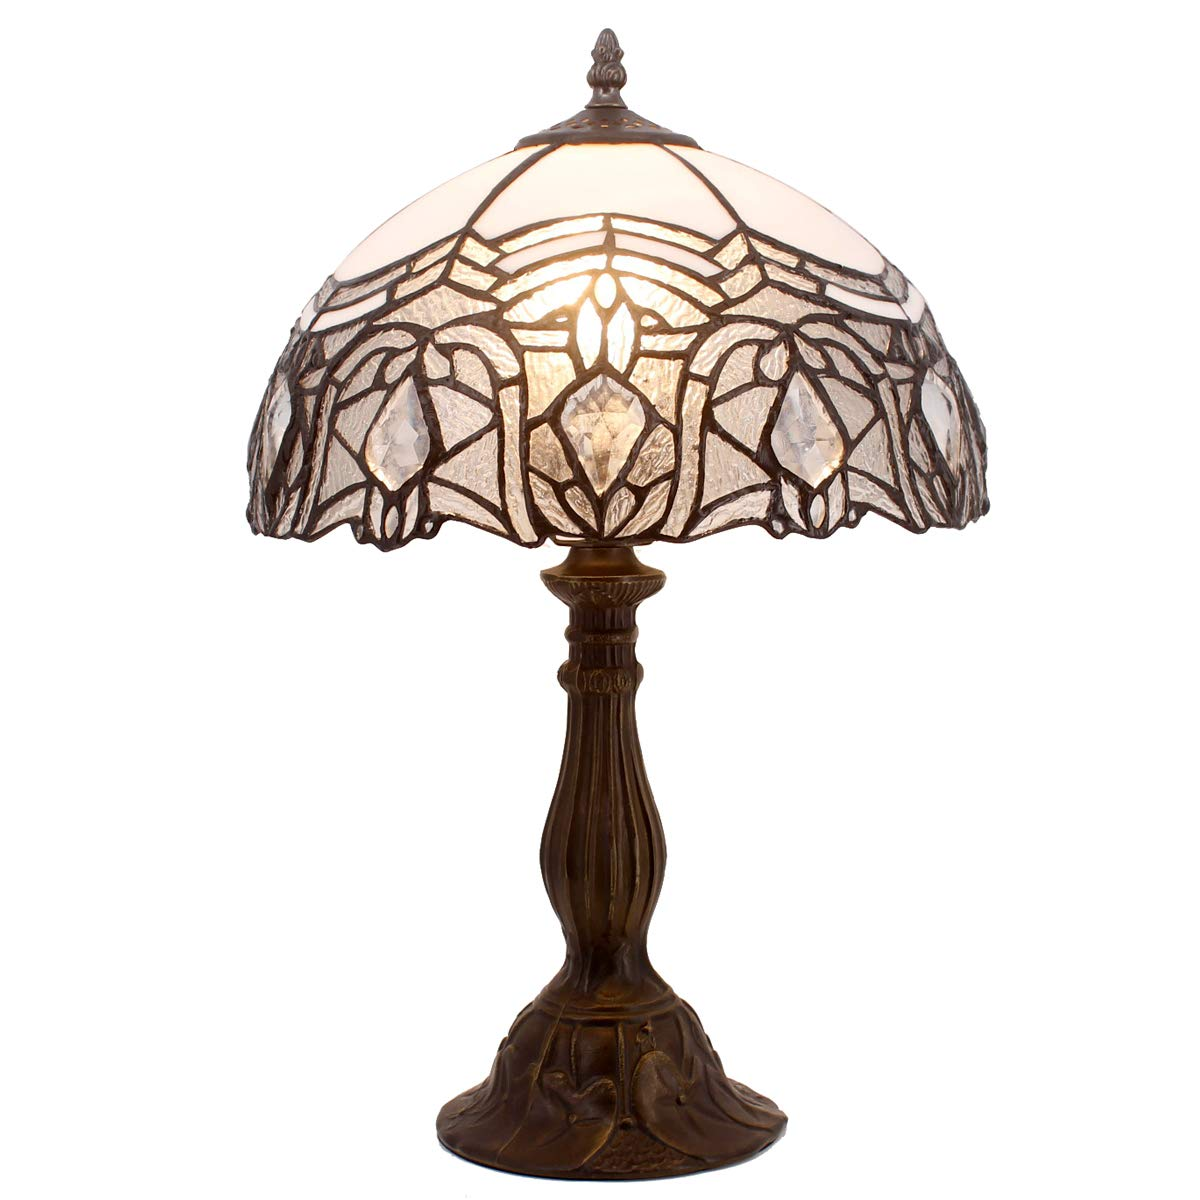 Quoizel TF1487T Lynch Tiffany Table Lamp, 2-Light, 150 Watts, Bronze 26 H x 16 W